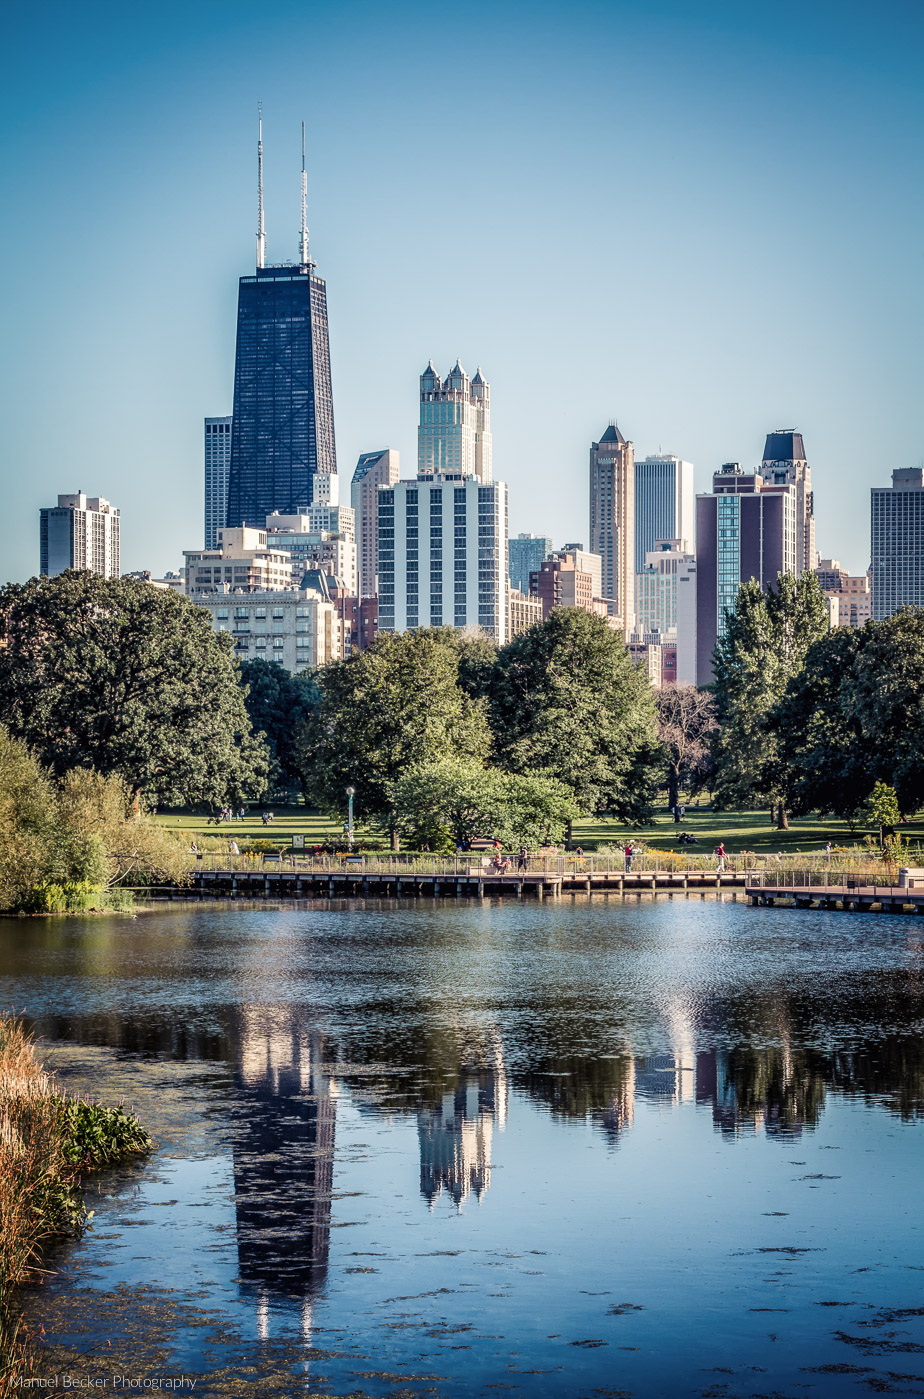 South Pond of Chicago Lincoln Park, USA